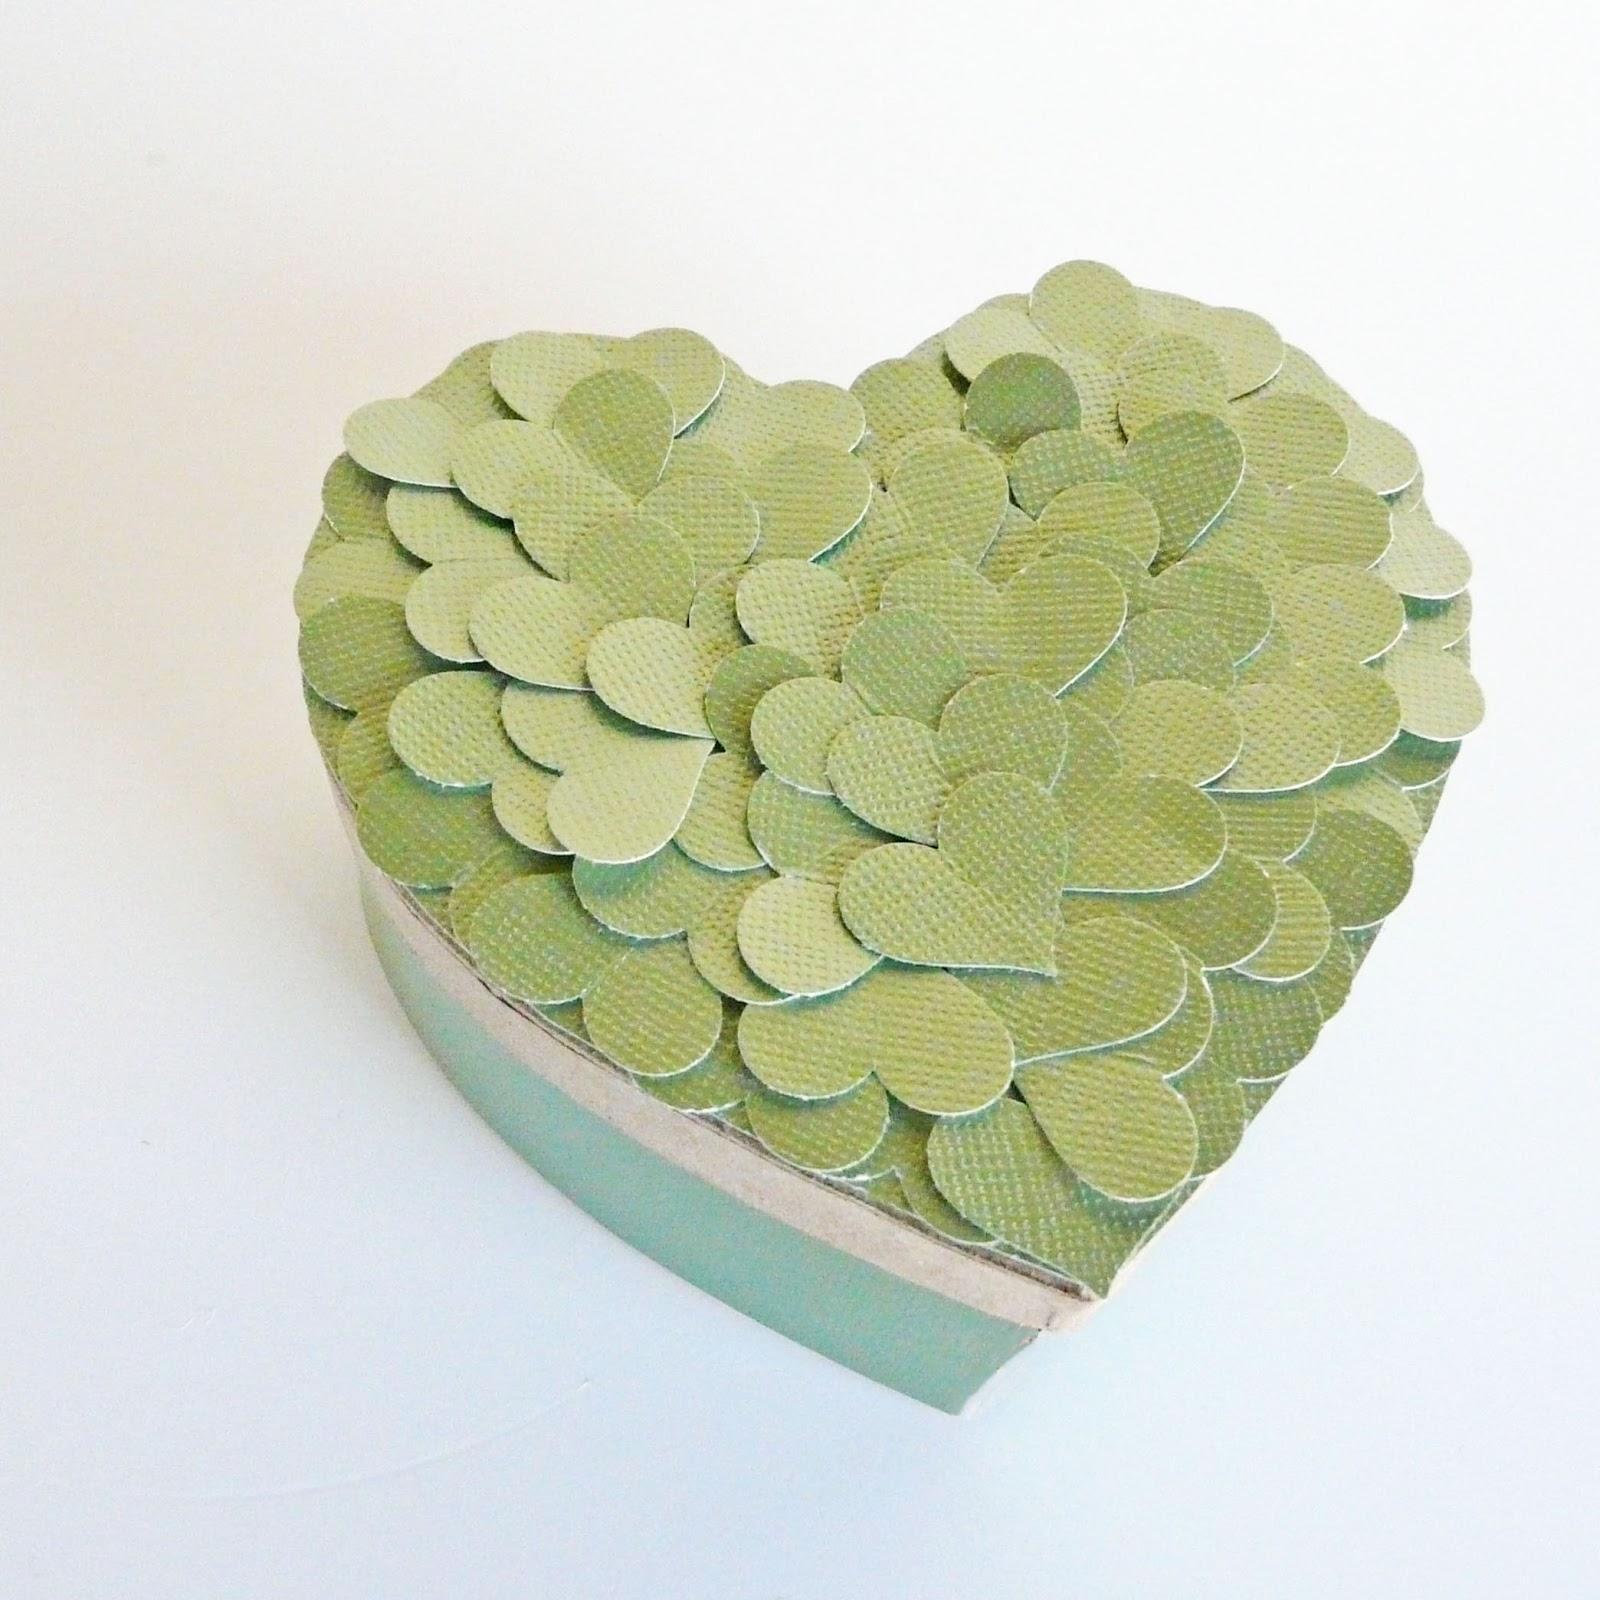 Decorative Boxes How To Make : Make decorative heart box